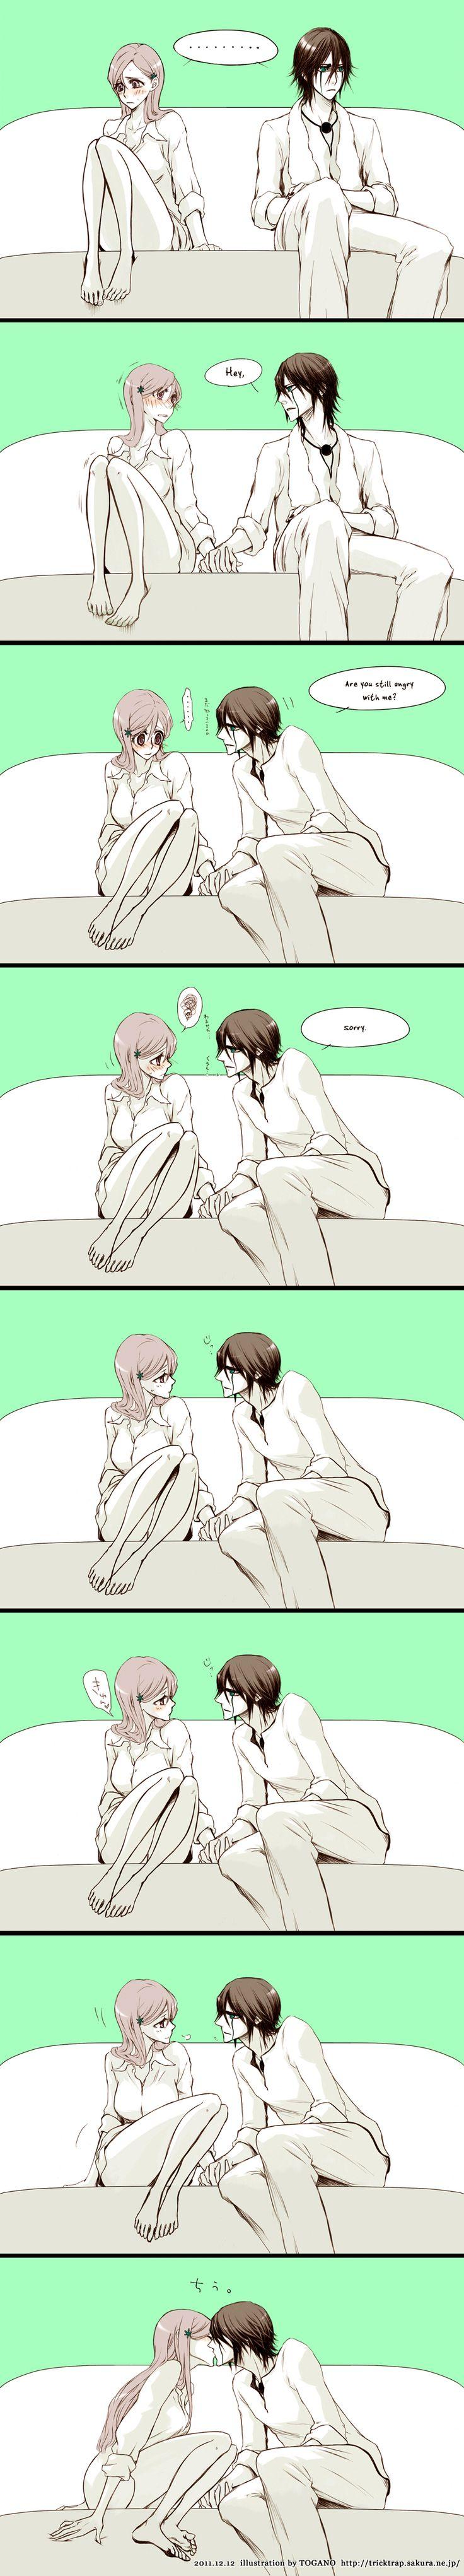 Although I've always shipped the pair Ichihime, this enlightened me <3 Rukia feel free to take Ichigo xD